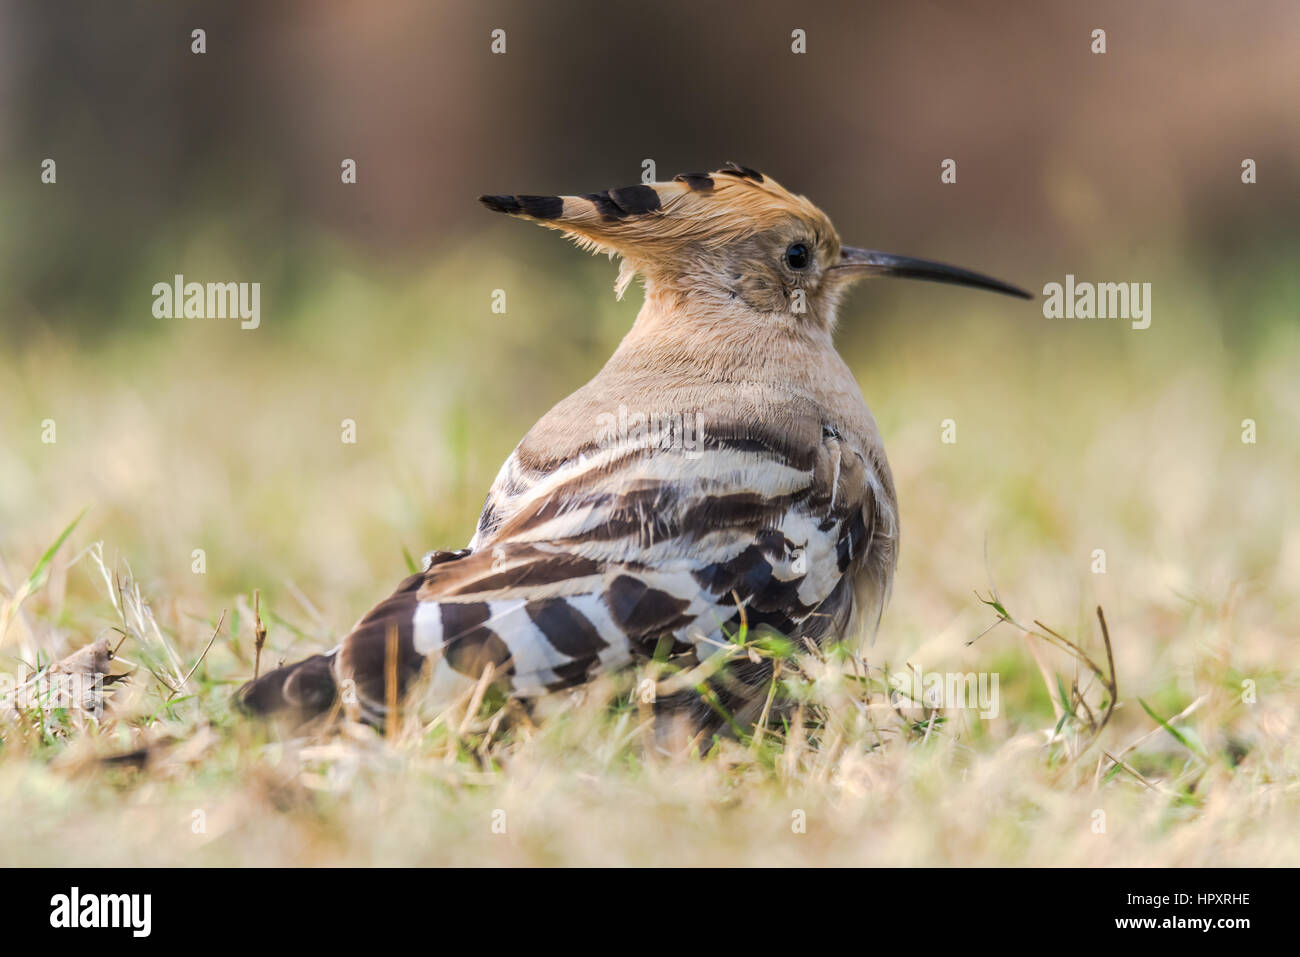 Colorful; Eurasian Hoopoe; Hoopoe; Paradisaeidae; Upupa epops; Upupidae; bif; birds; birds in flight; birds photography; - Stock Image